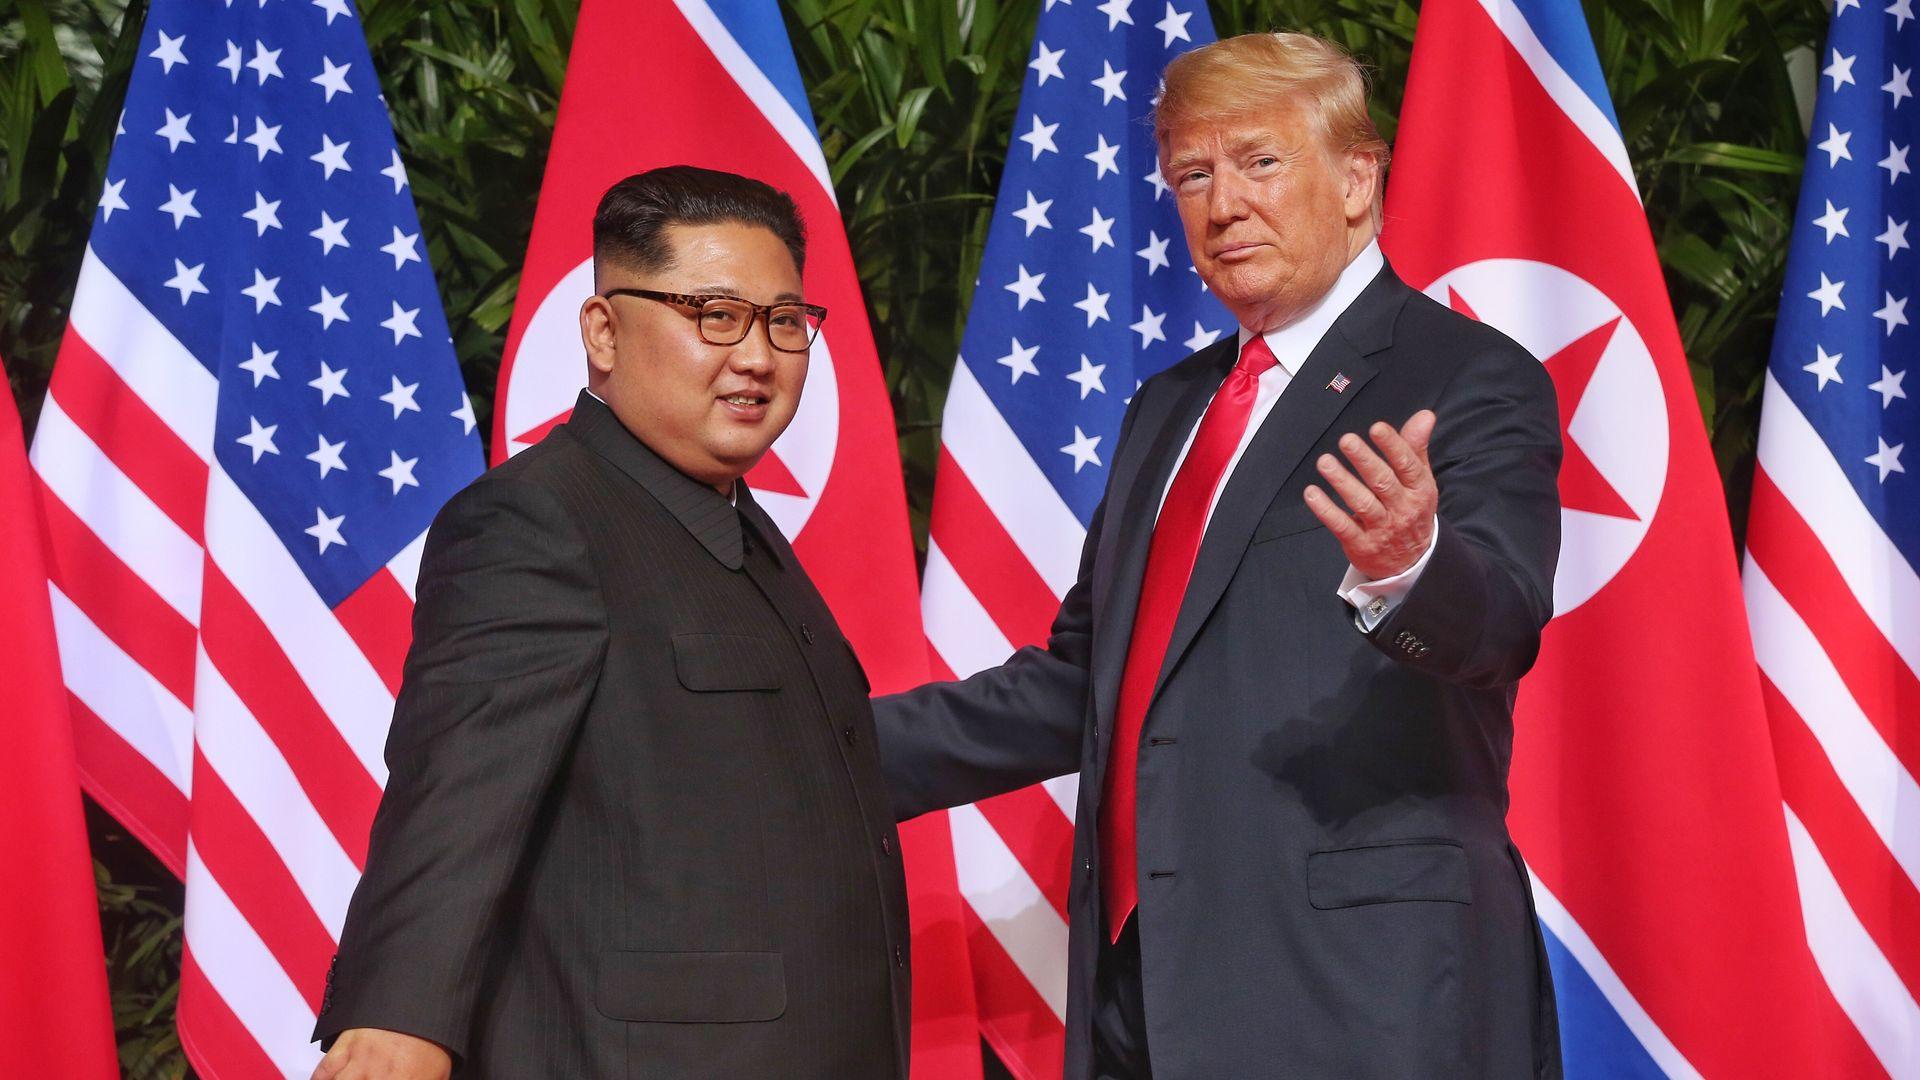 Trump greets Kim Jong-un in Singapore